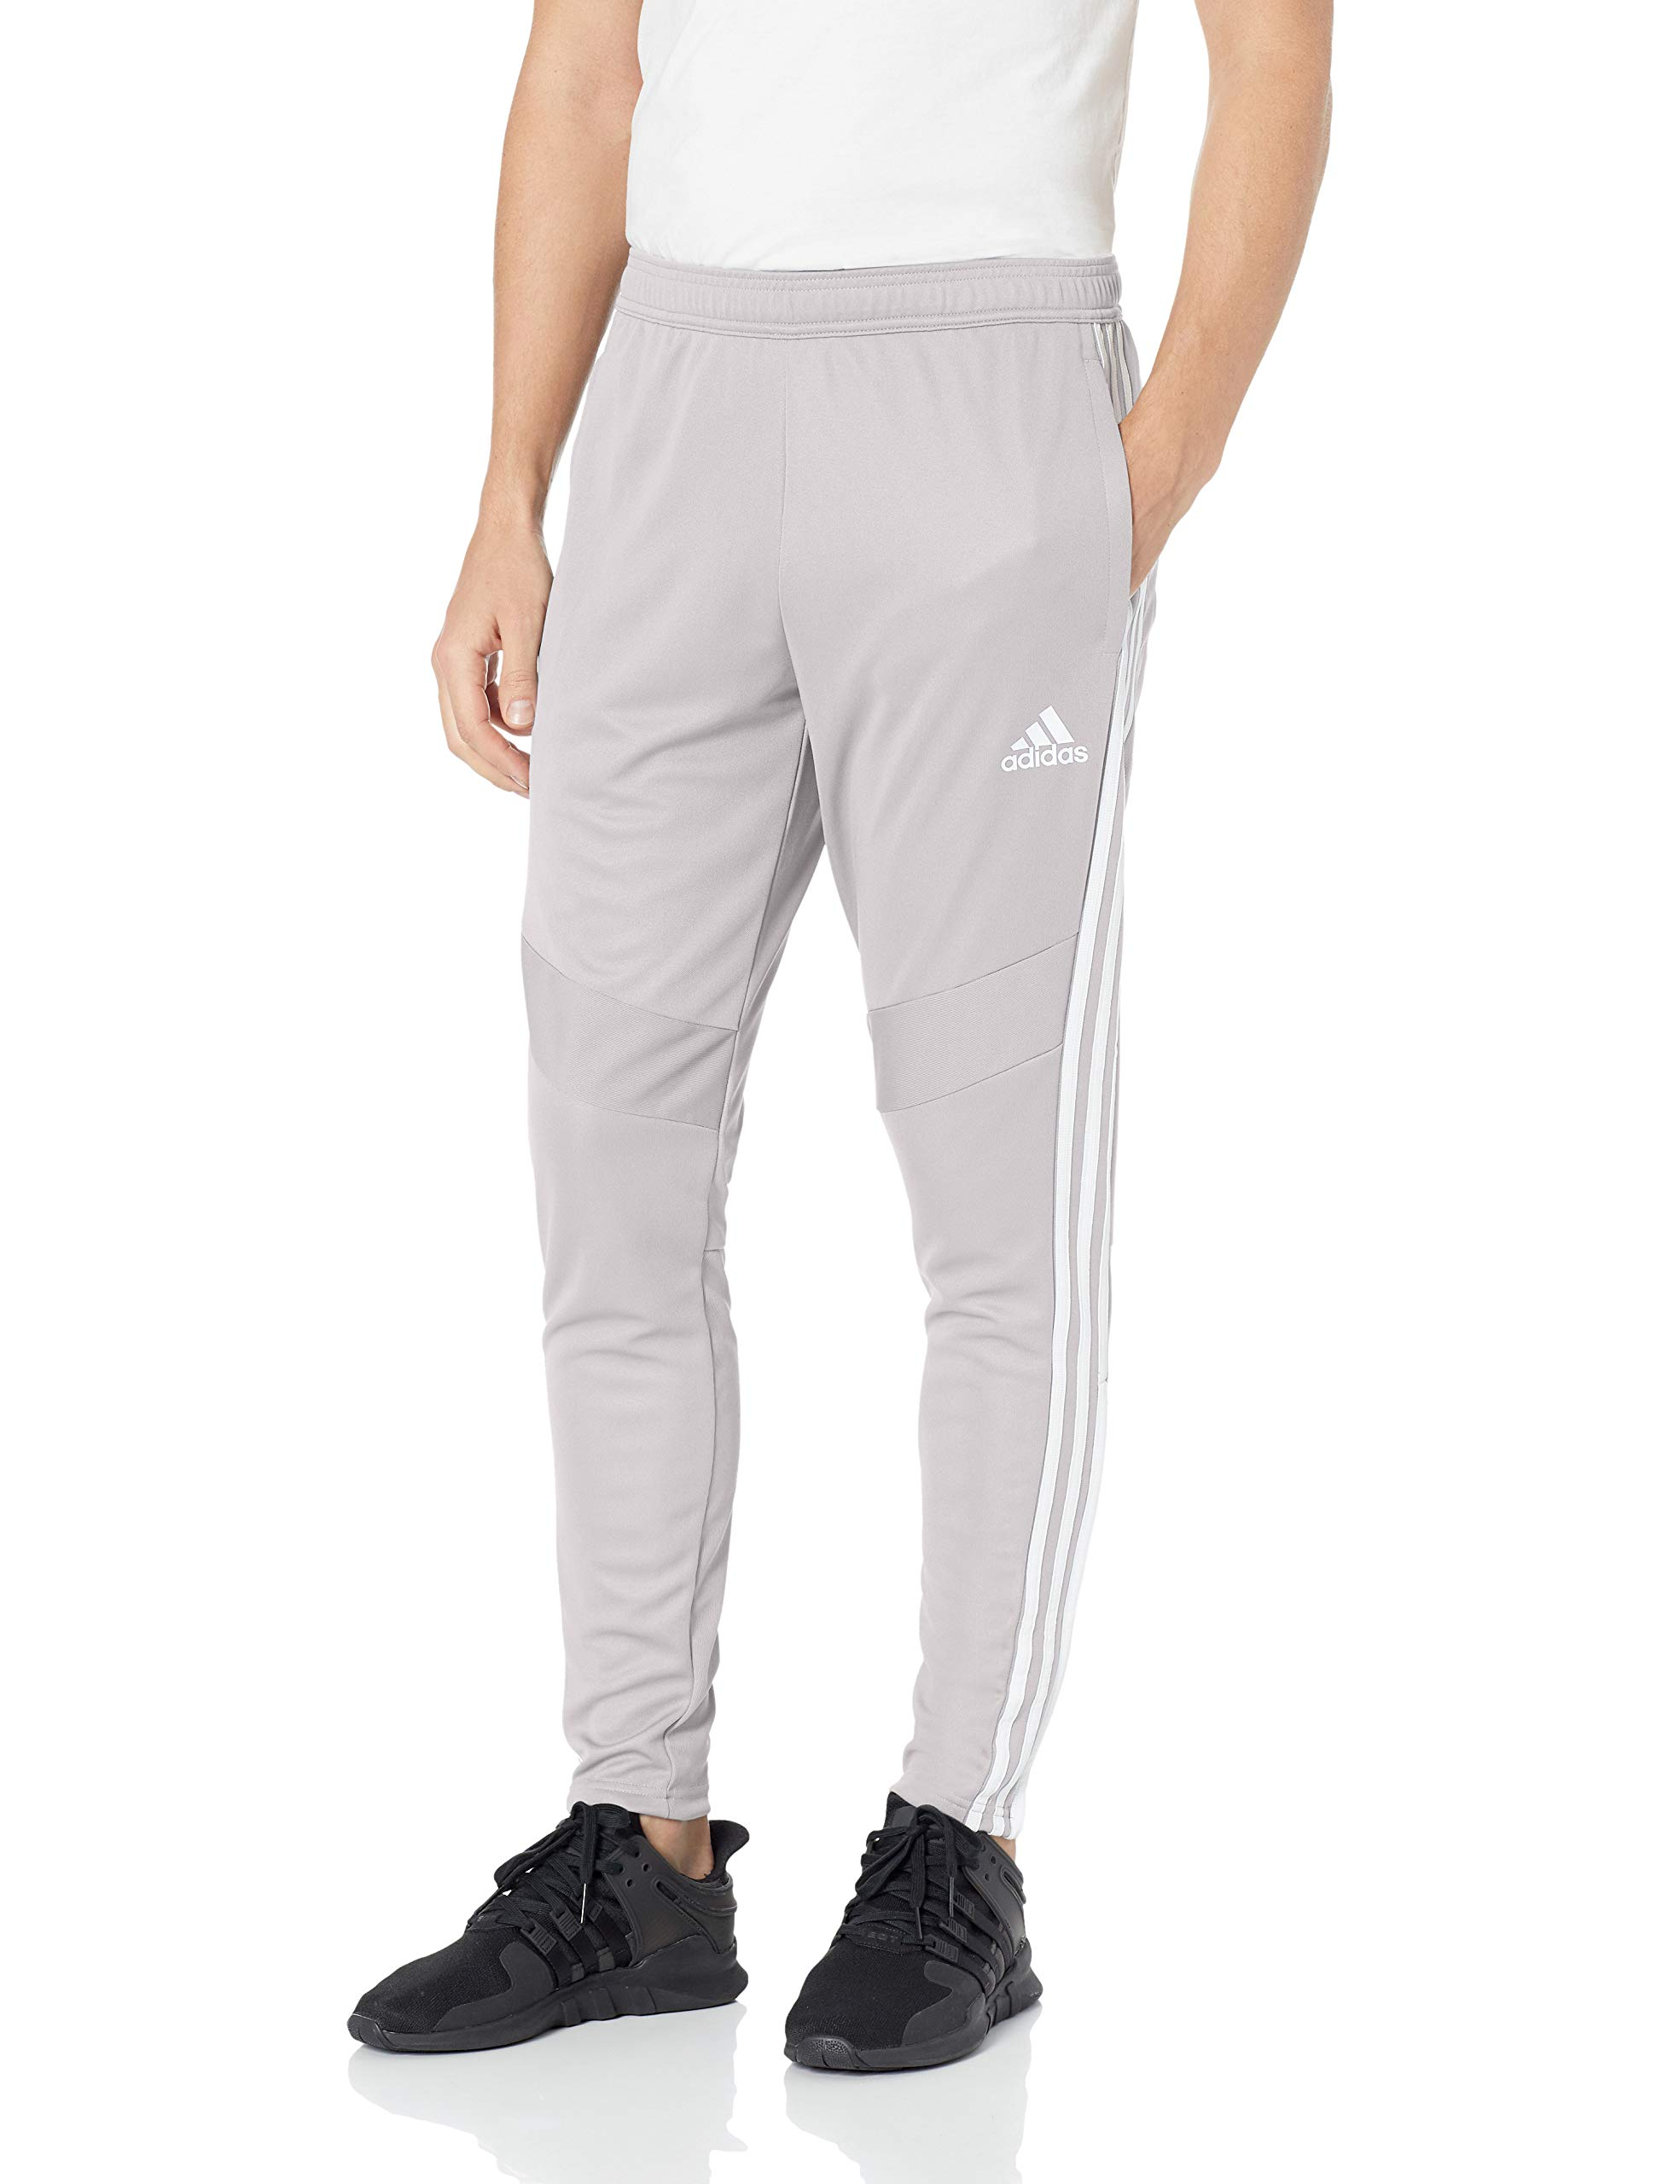 adidas Men's Tiro '19 Pants, WhiteLight GraniteGrey, XX Large